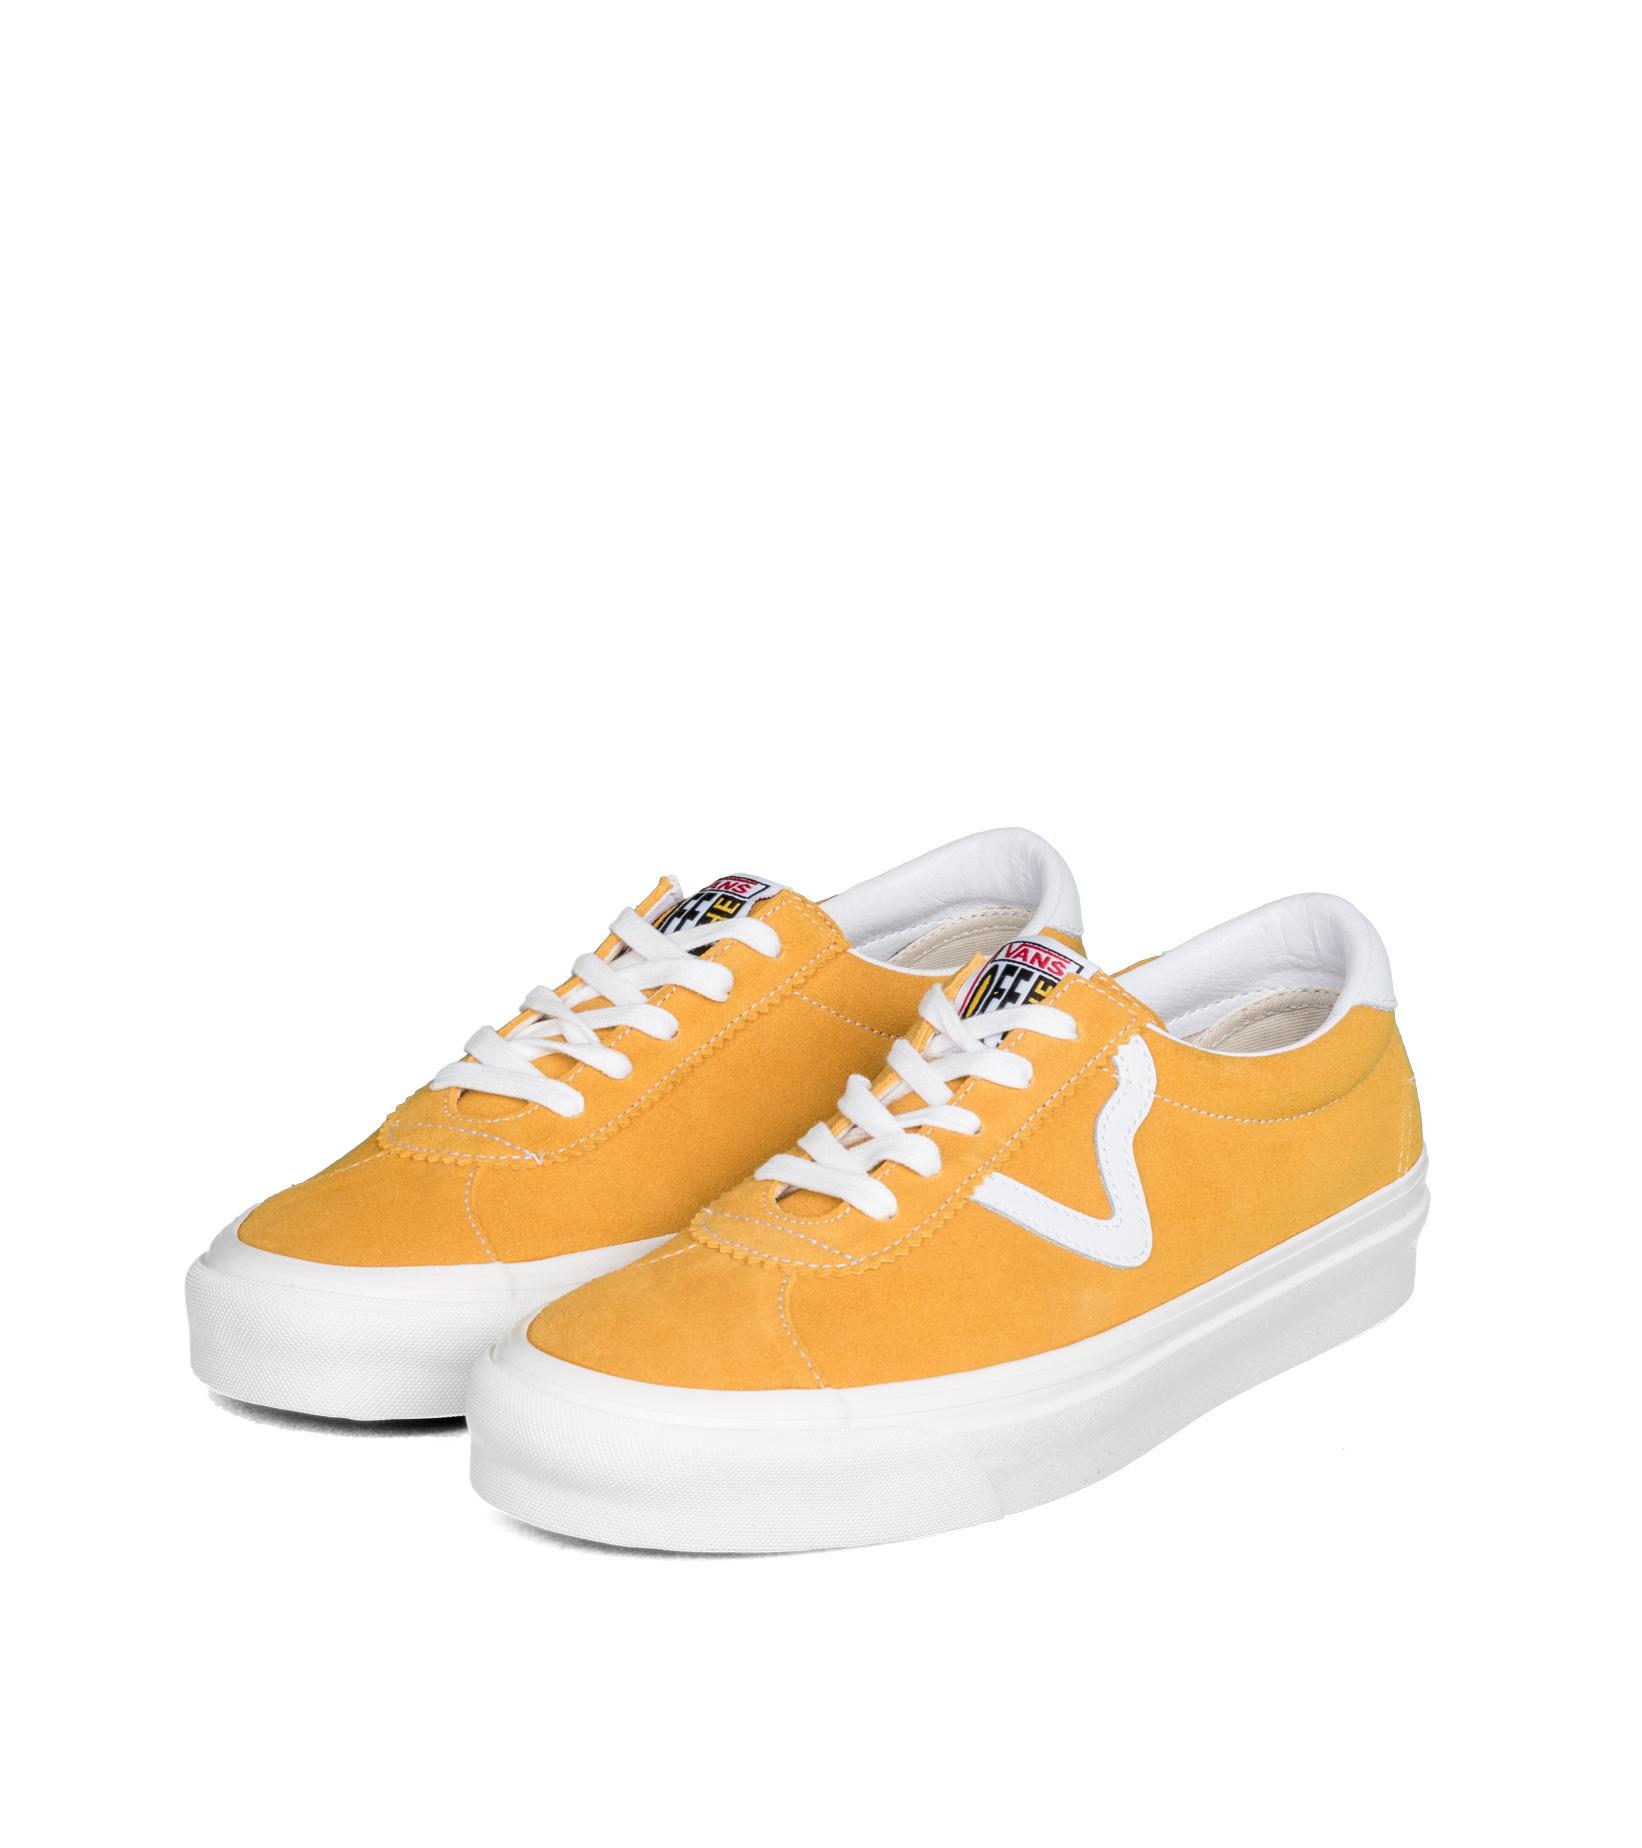 "Style 73 DX (Anaheim Factory) ""OG Saffron""-1"